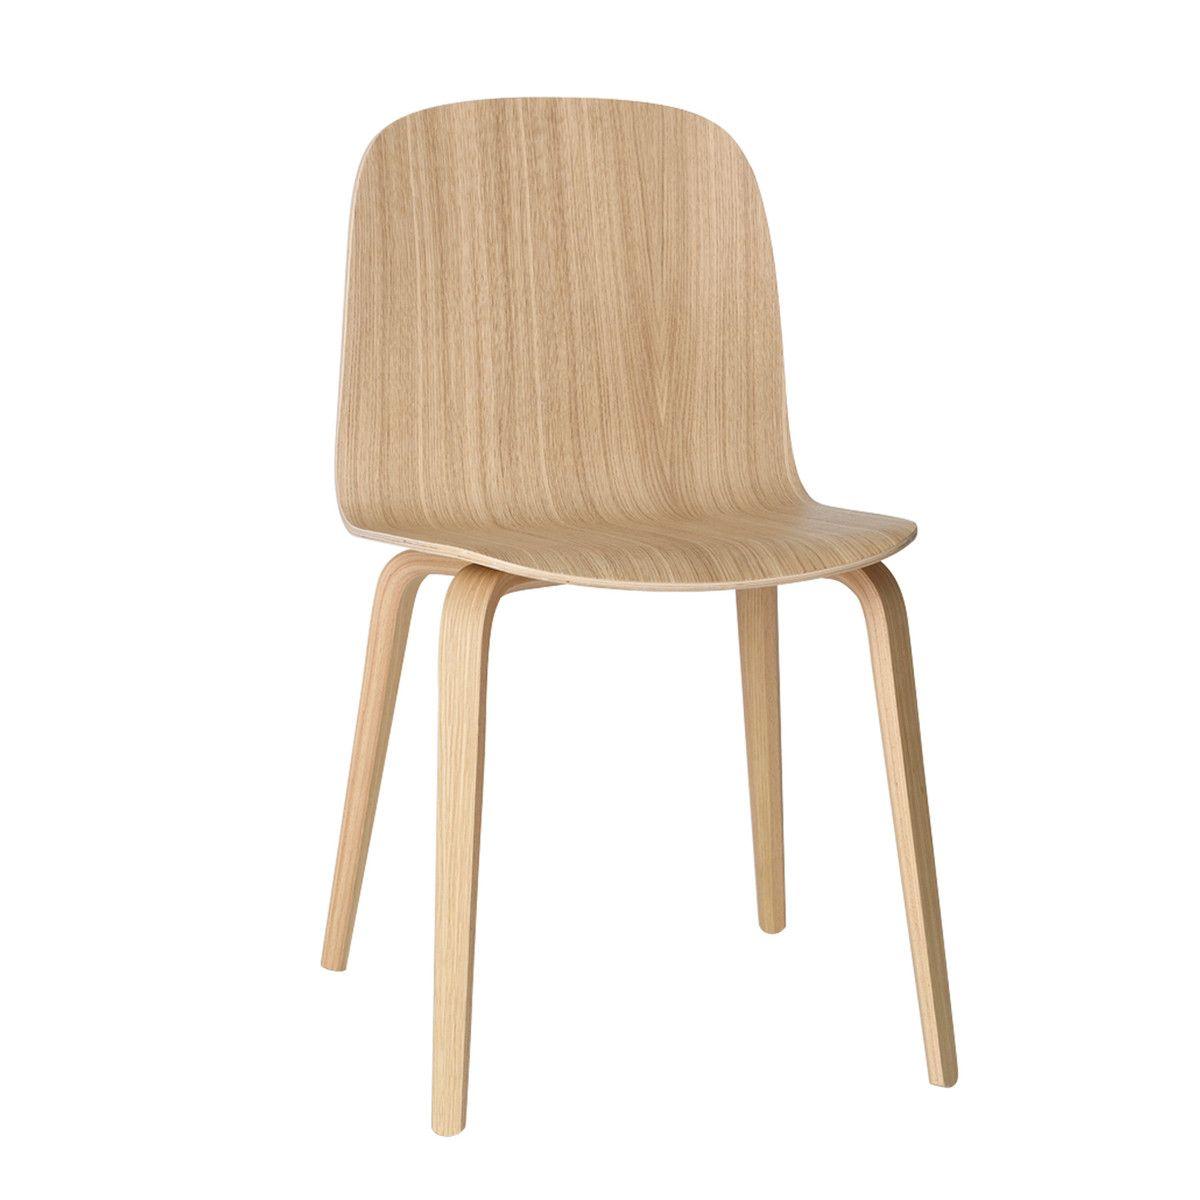 Muuto Visu Stuhl Eiche Eiche Eiche Natur T 50 H 80 B 45 Stuhle Skandinavische Esszimmerstuhle Esszimmerstuhle